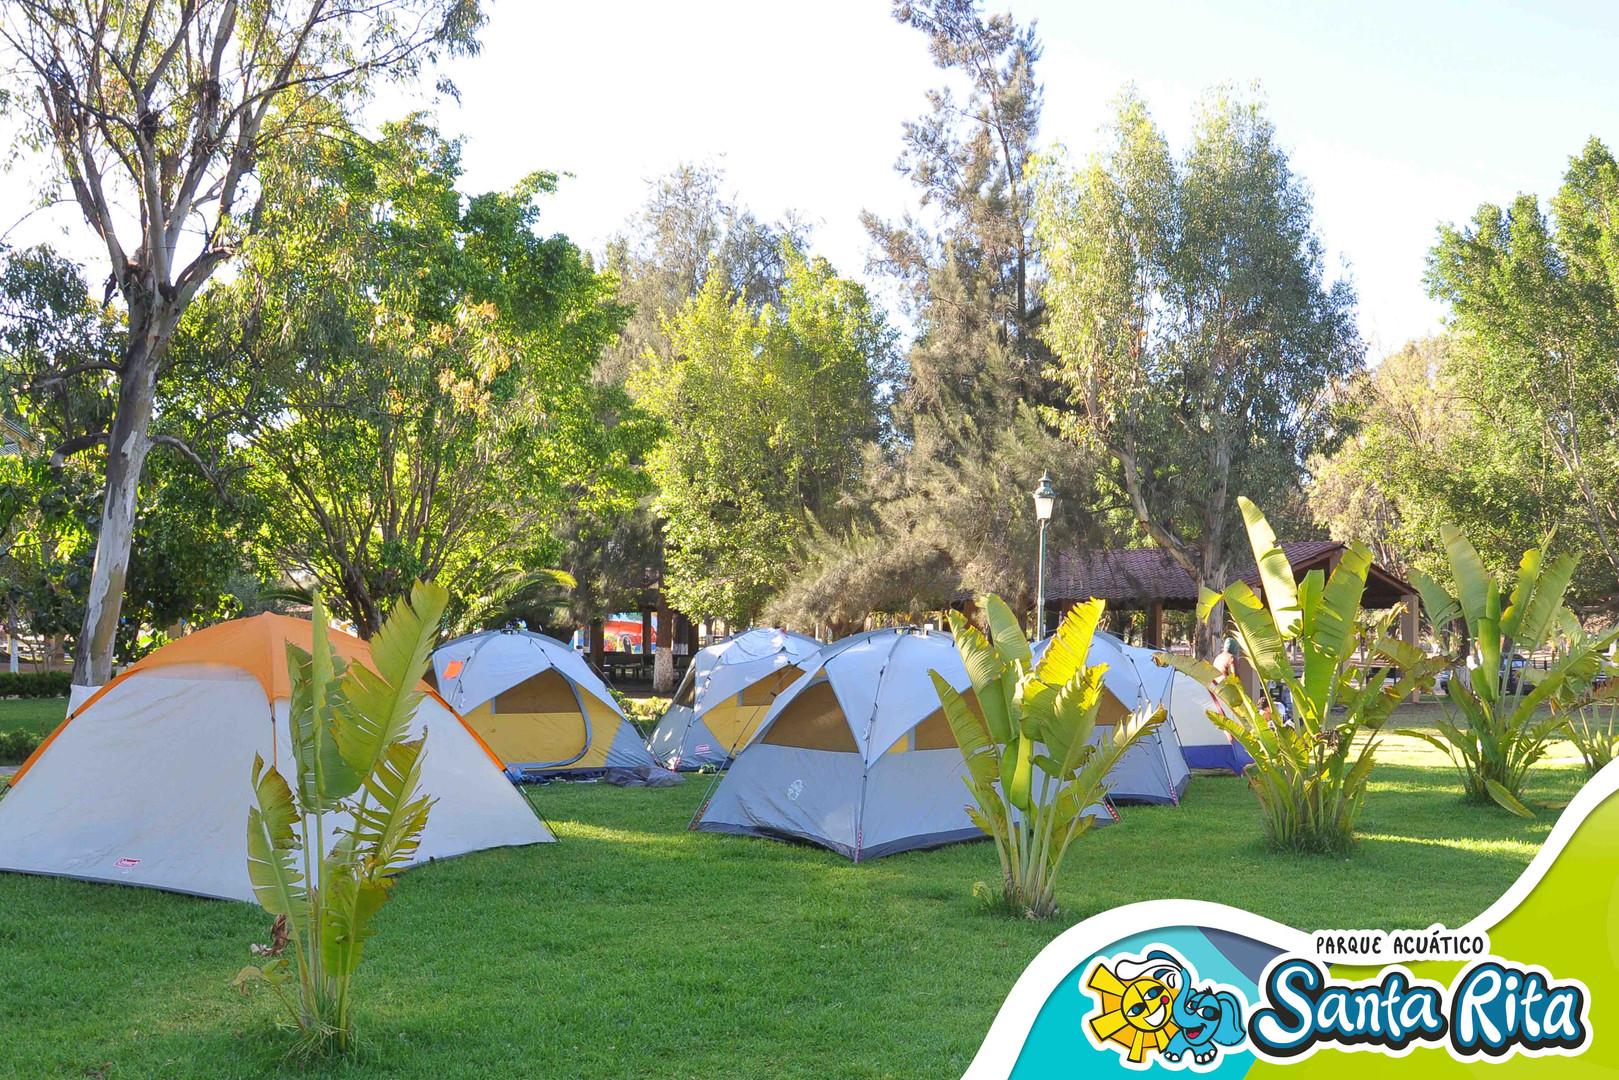 Campingparqueacuaticosantarita2.jpg